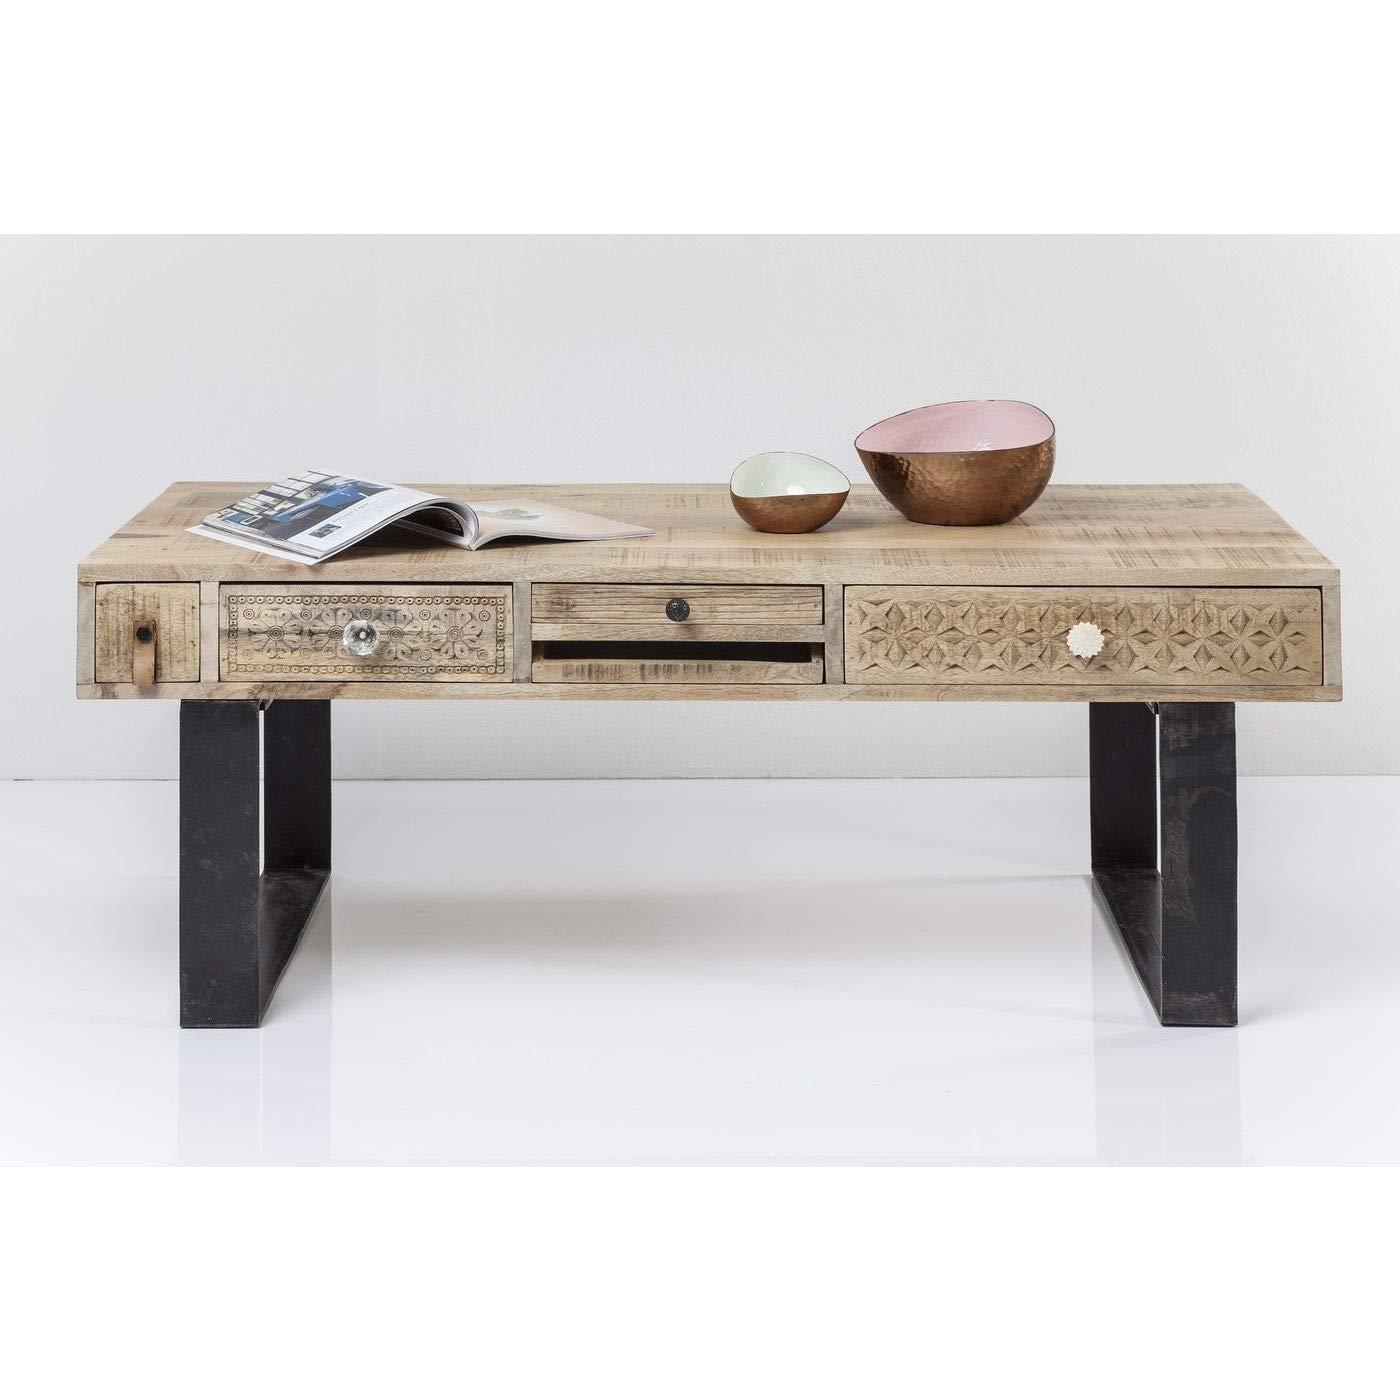 Kare Basse 120x60cm Maison DesignCuisineamp; Table Puro 0XnOP8wk